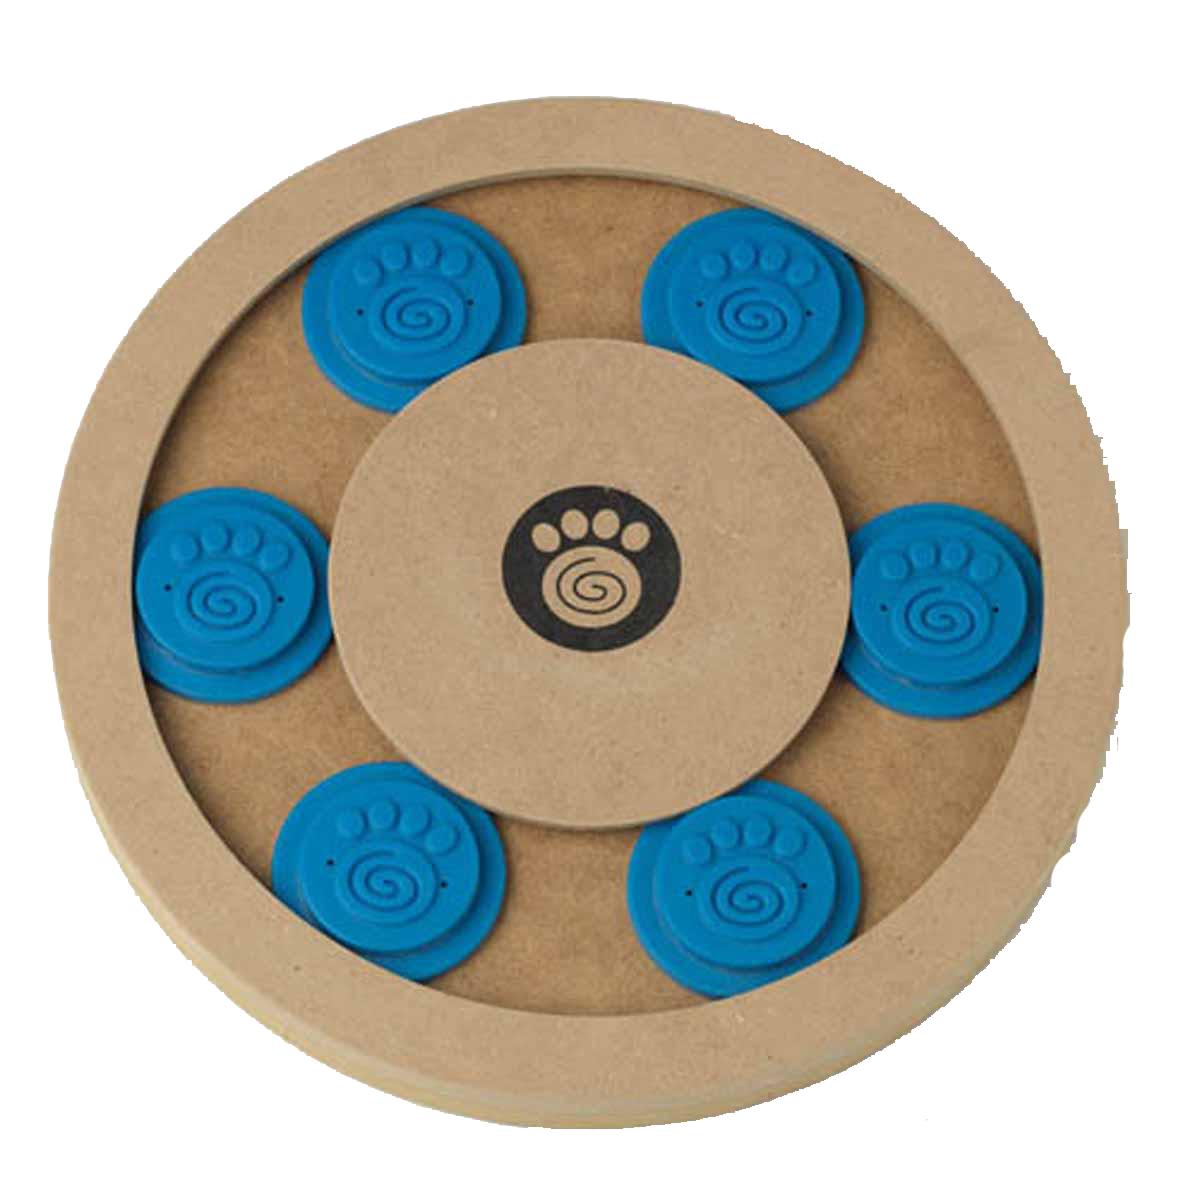 ThinkRageous Interactive Dog Toy - Intermediate